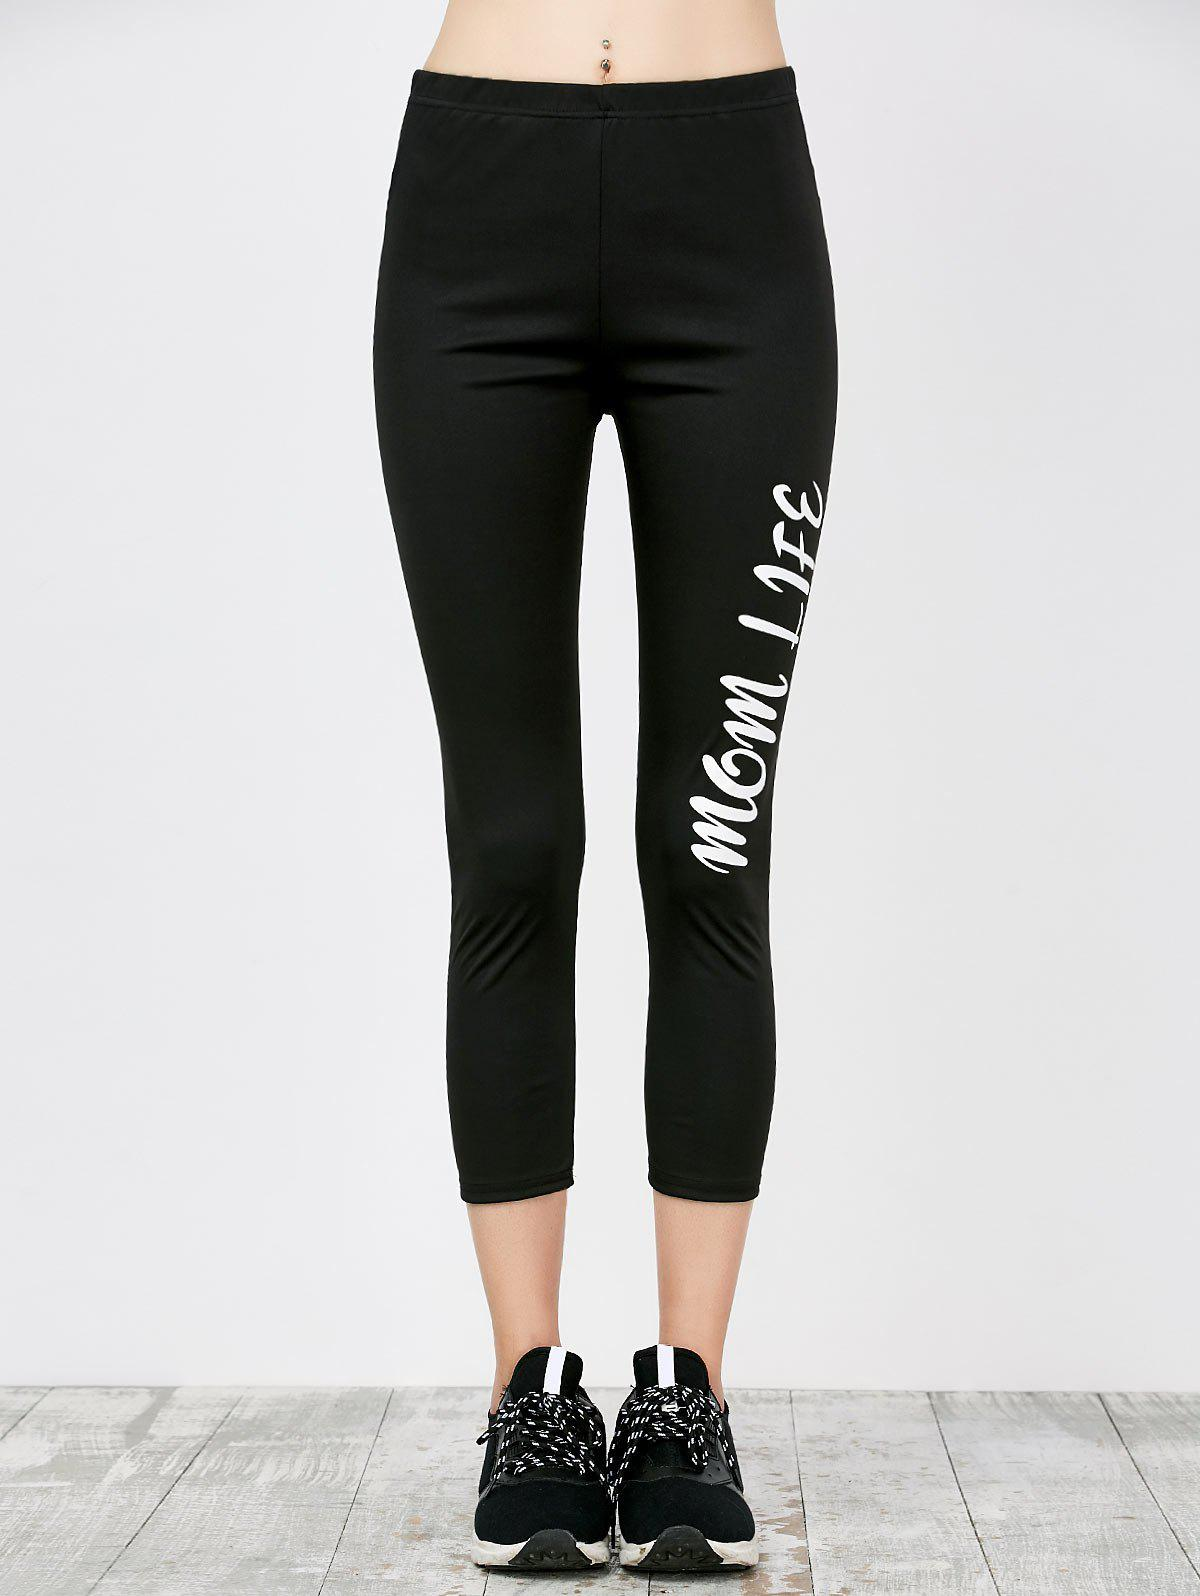 Skinny Letter Print Workout Capri Pants 210635203